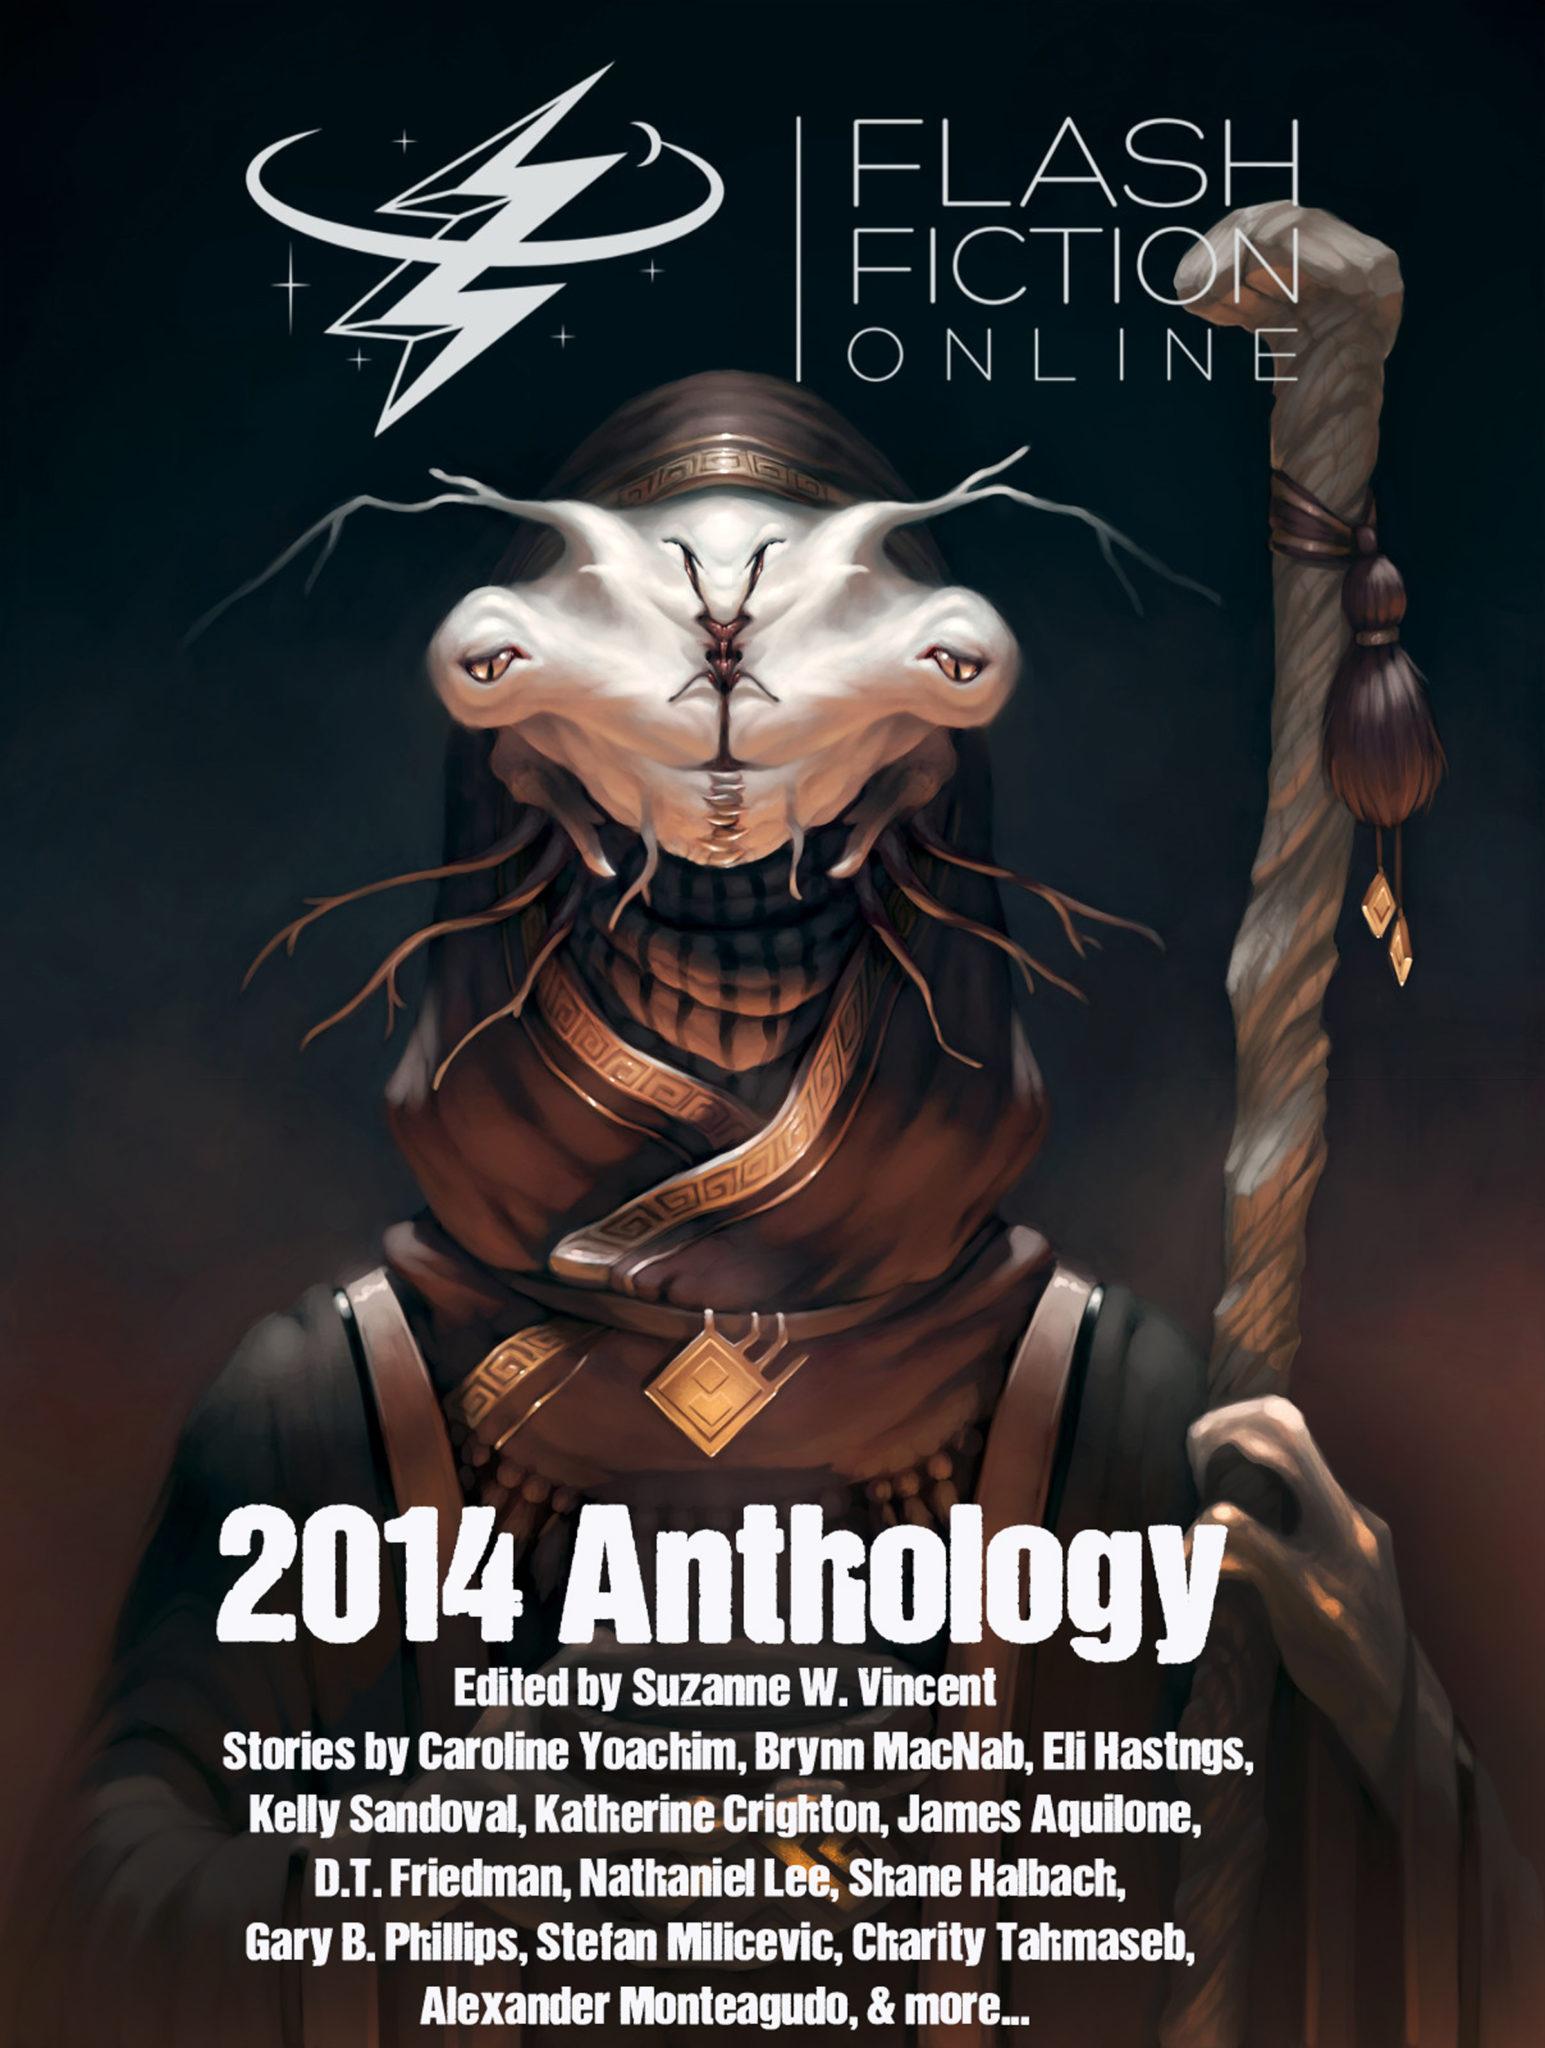 Flash Fiction Online 2014 Anthology Cover